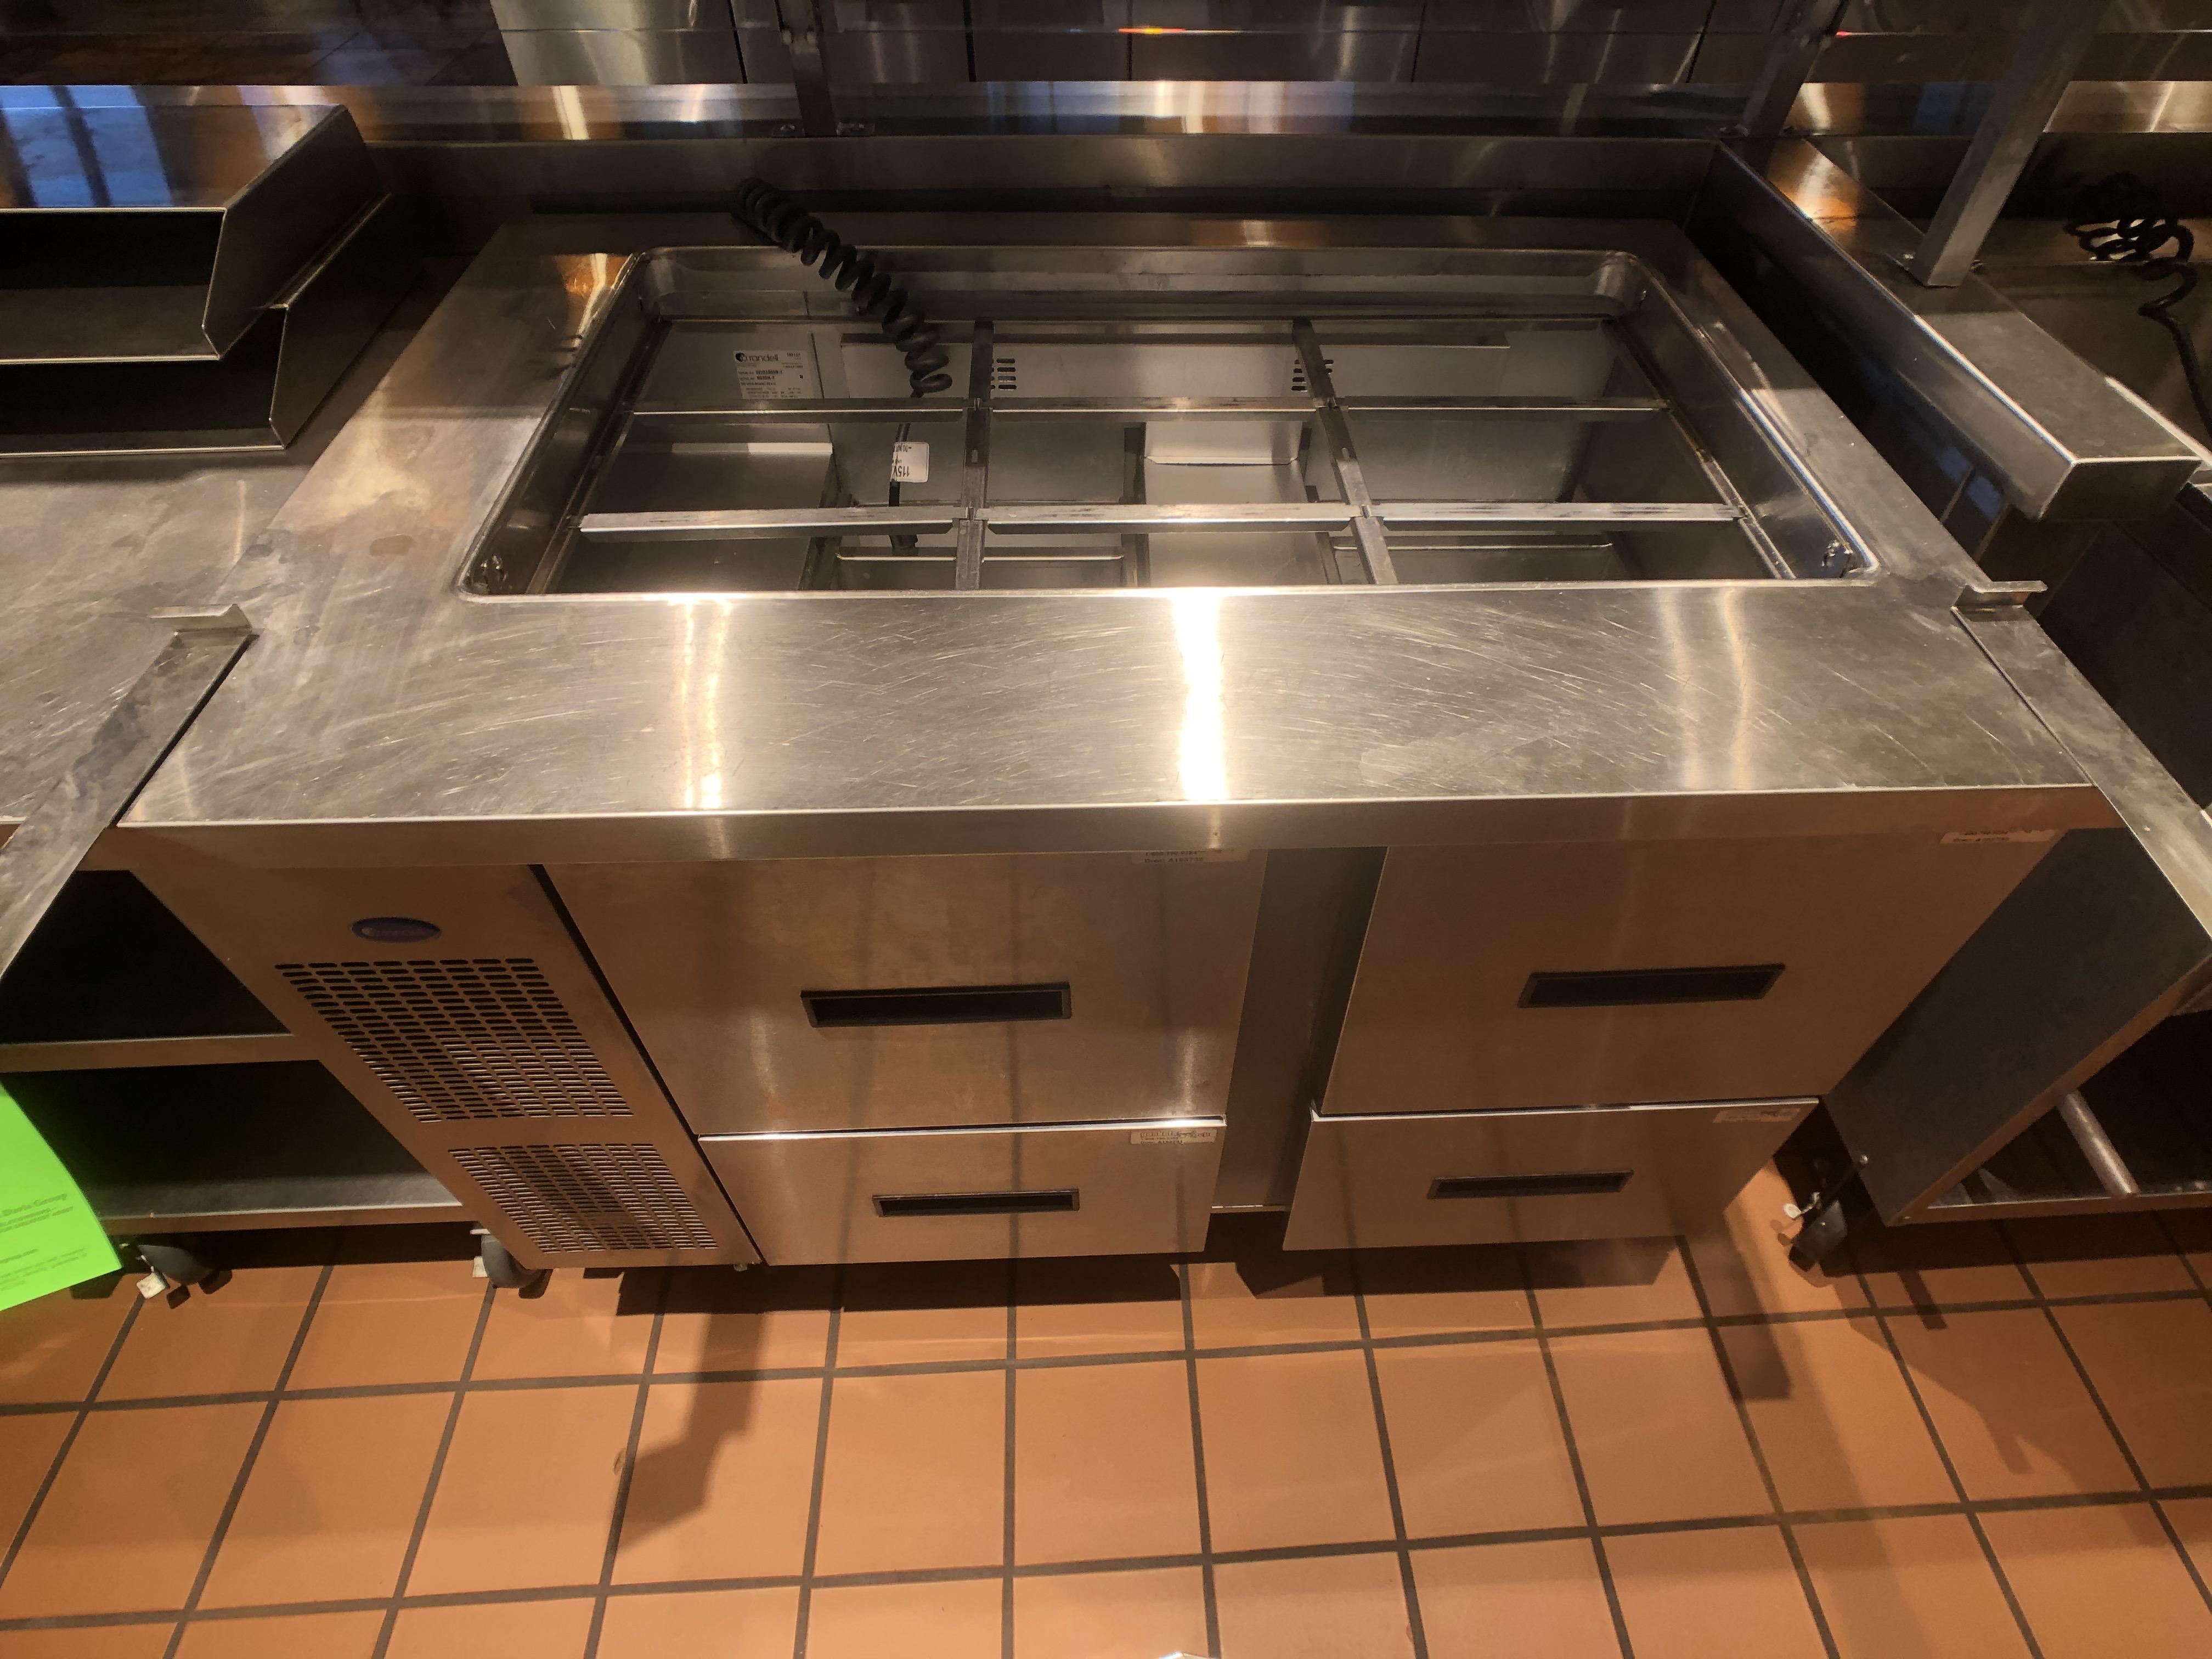 "Randell Refrigerator / Sandwich Prep Table, Model 9030K-7, S/N W1035669-1, 48"" W x 33"" D36"" H - Image 4 of 5"